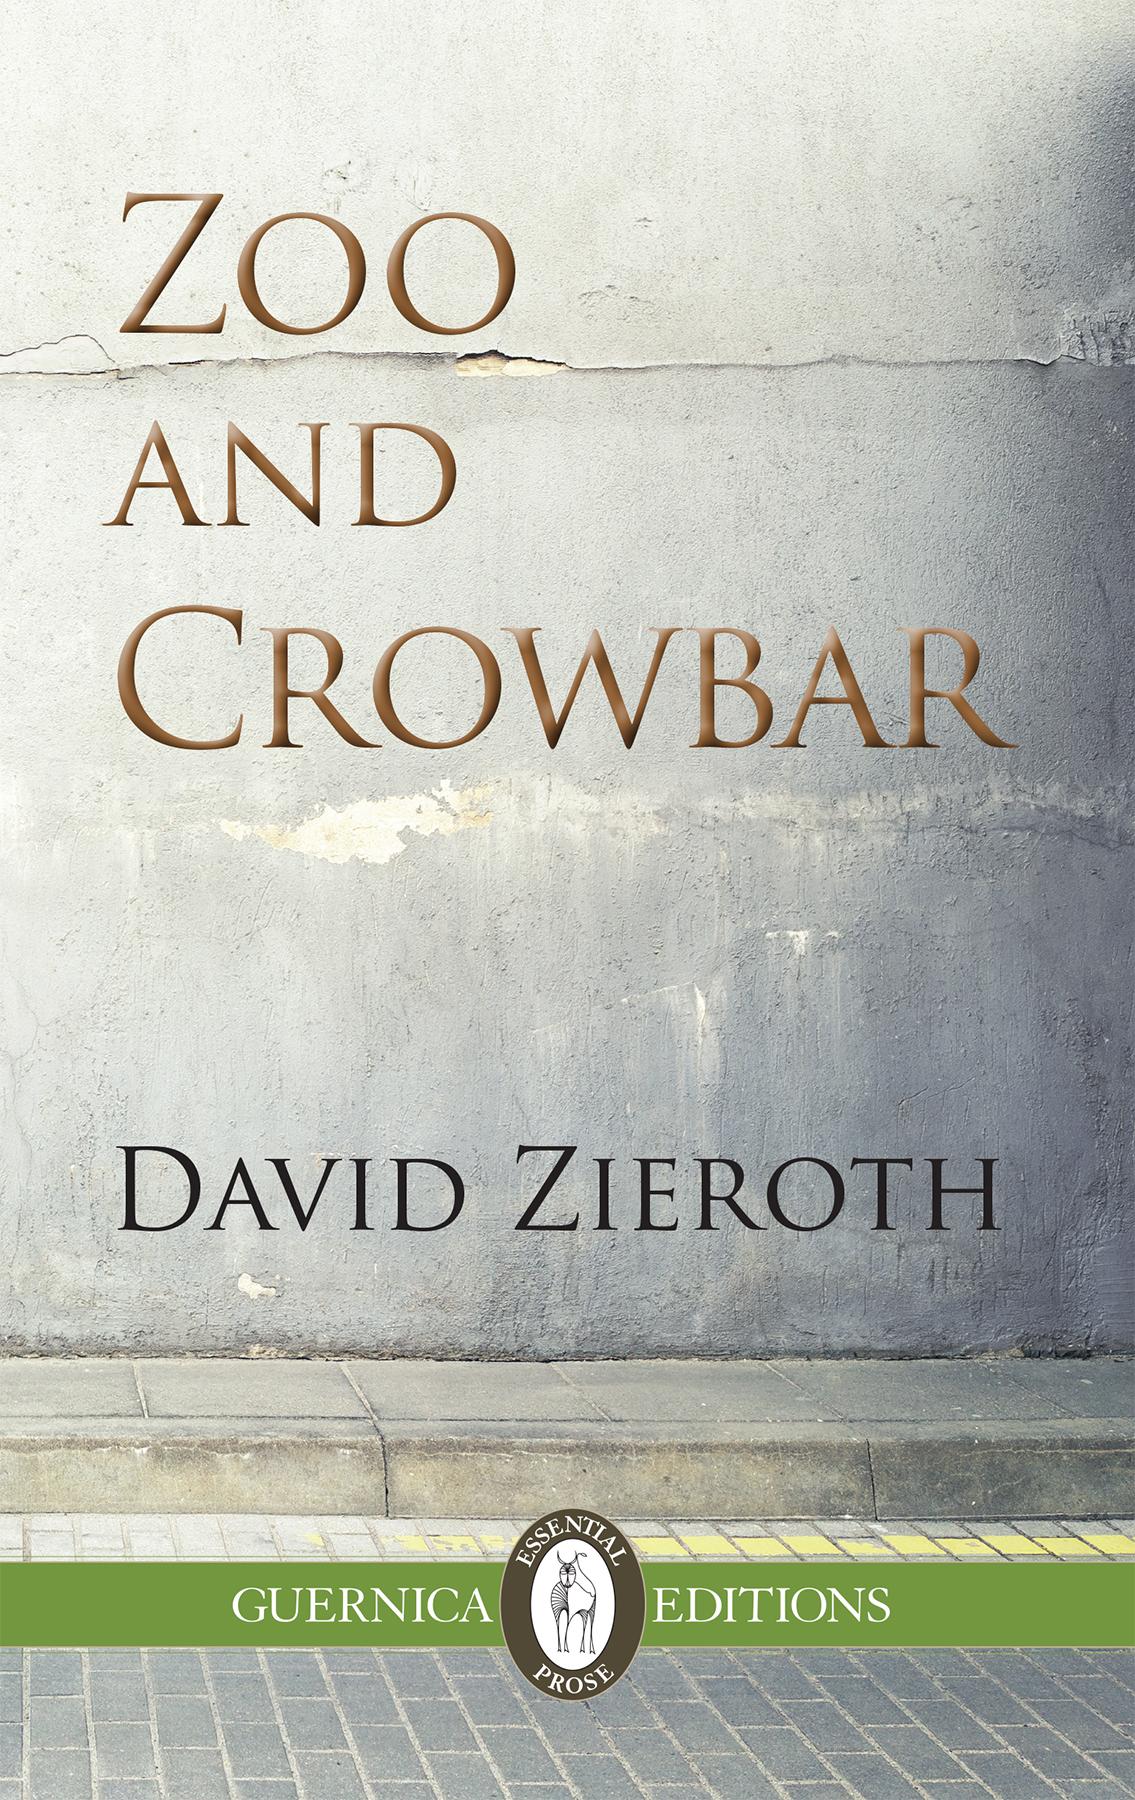 Zoo and Crowbar